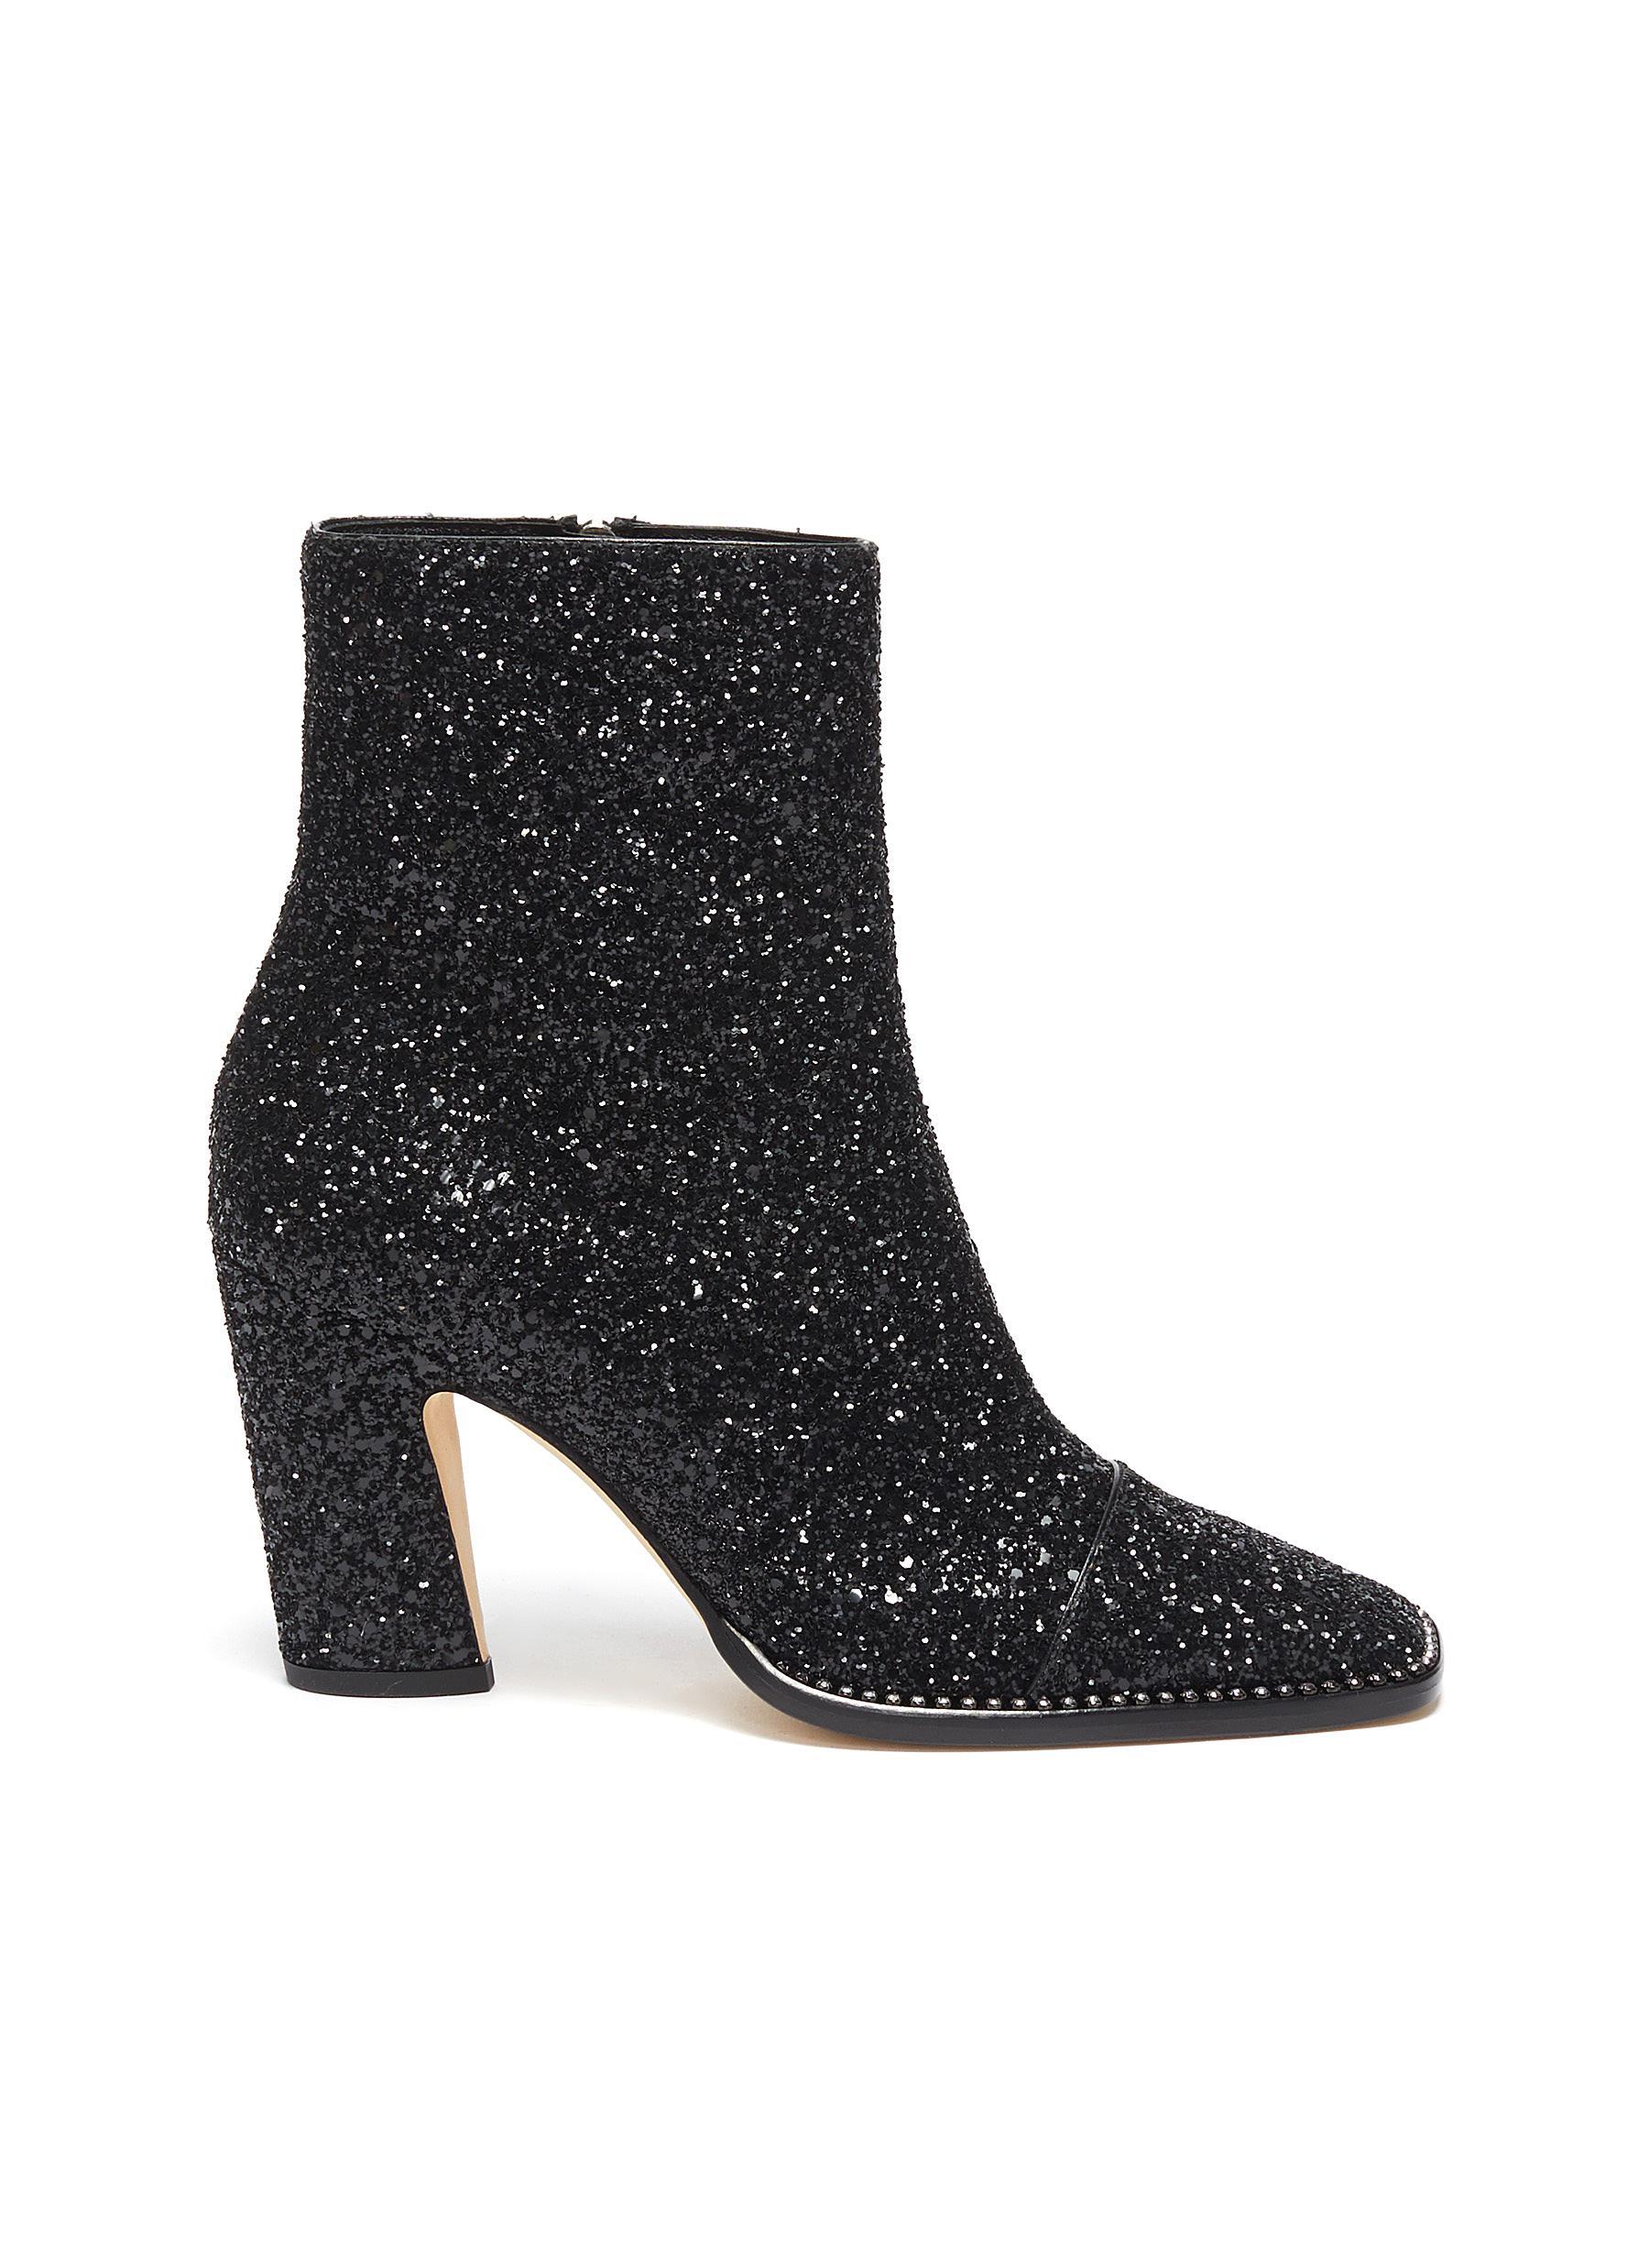 Jimmy Choo Boots Mavin 85 crystal trim glitter ankle boots